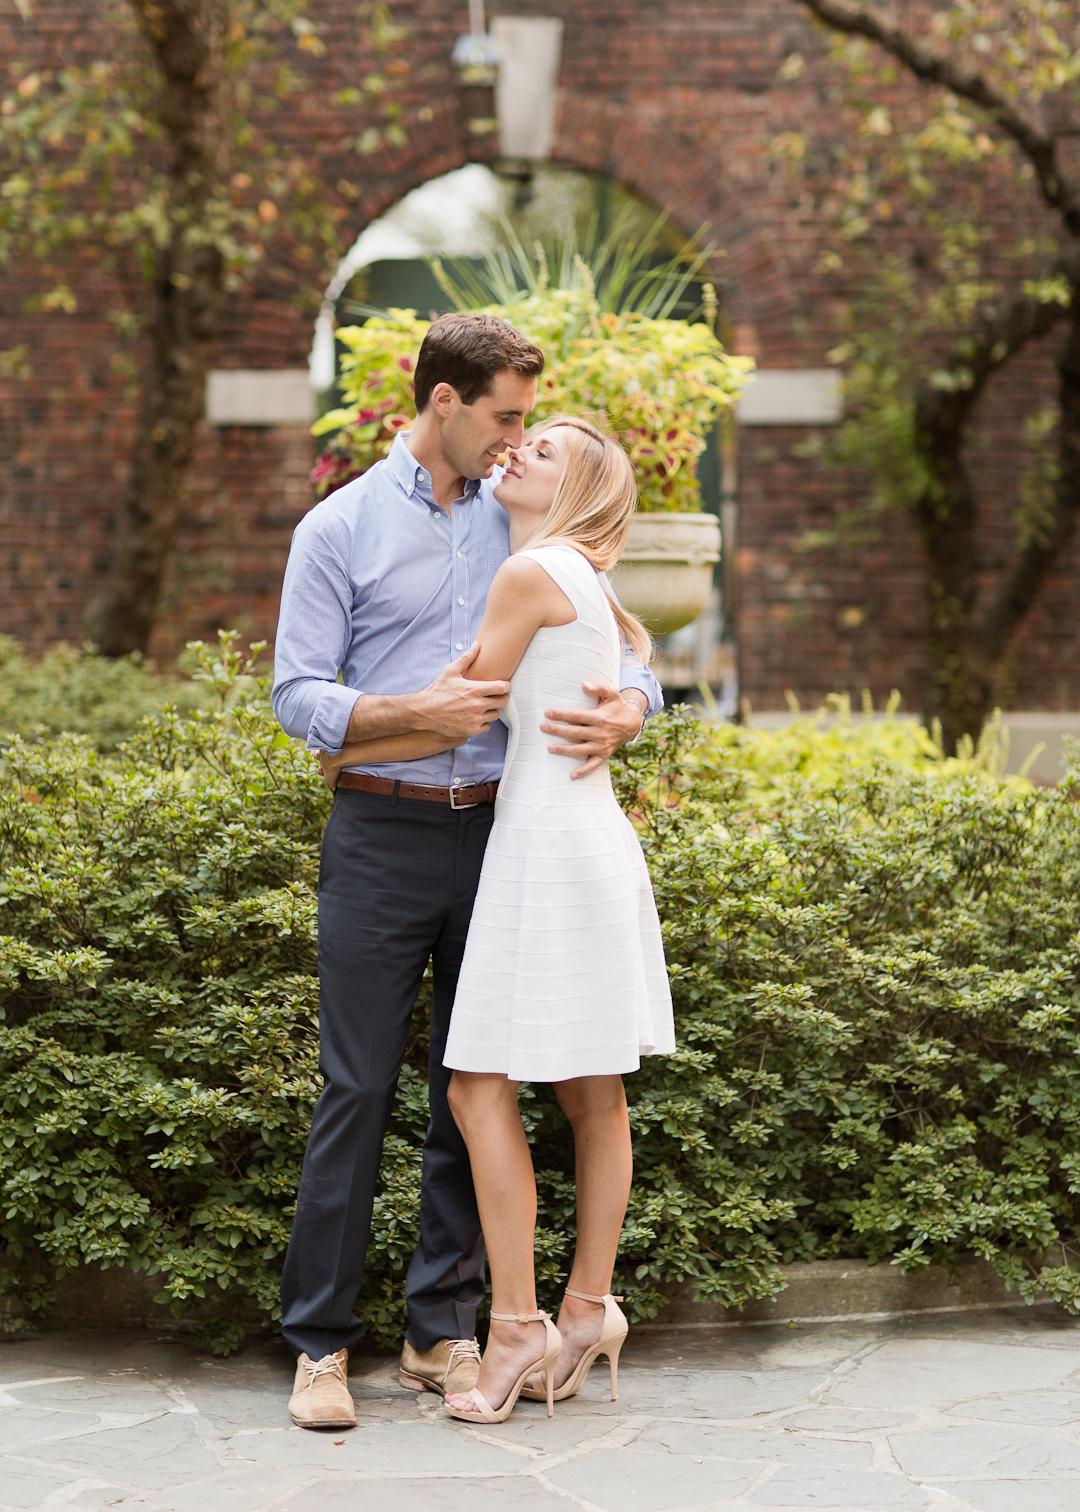 Melissa Kruse Photography - Daniece & Chris West Village Engagement Photos-58.jpg